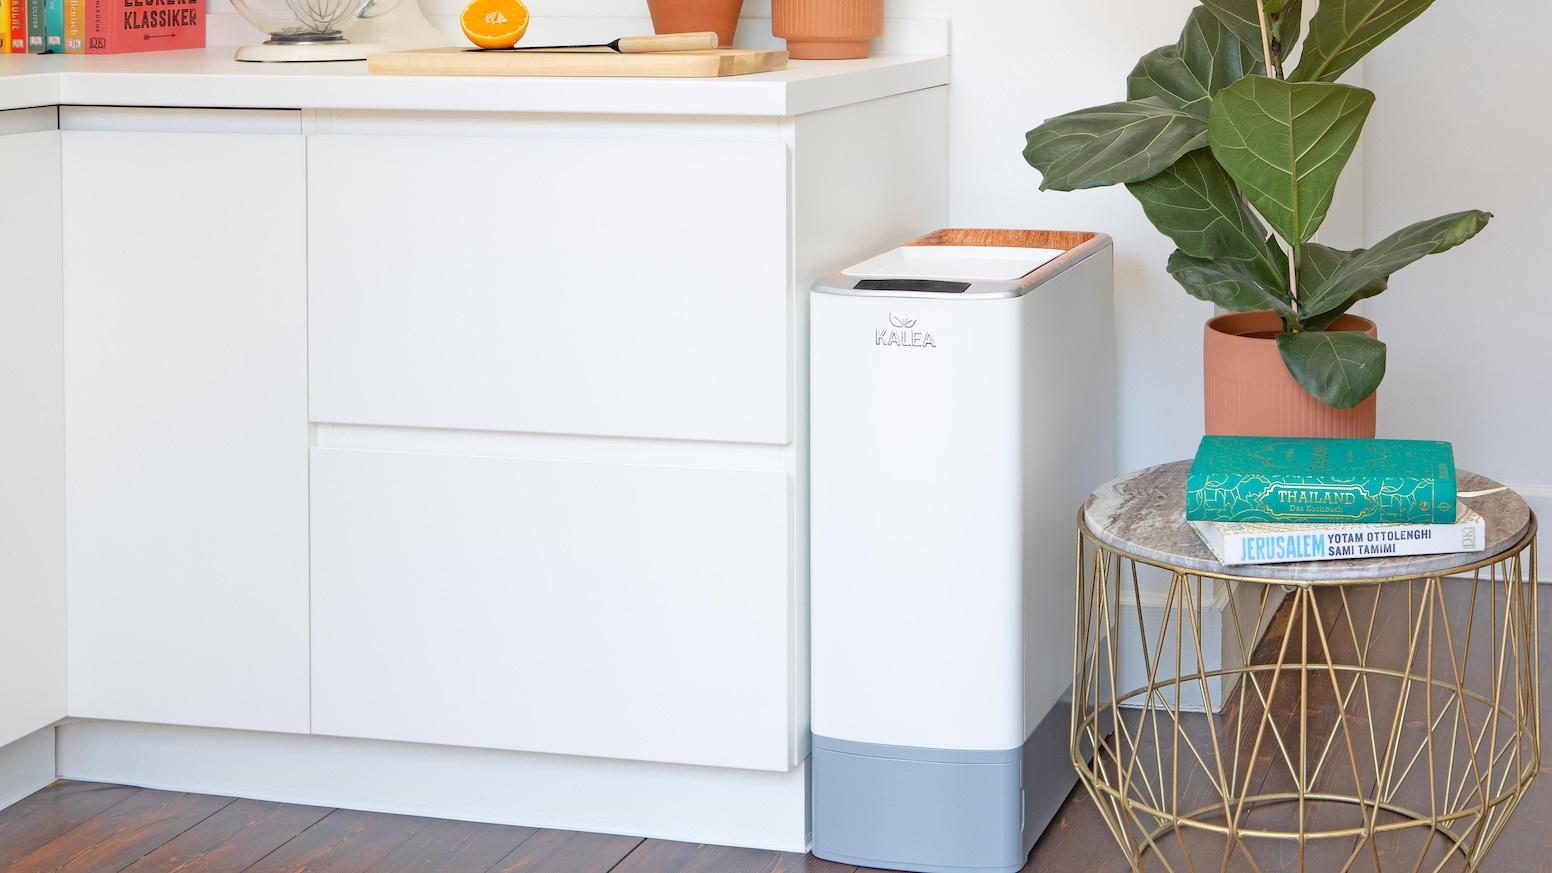 Kalea Turn Kitchen Waste Into Real Compost In Only 48h By Kalea Kickstarter